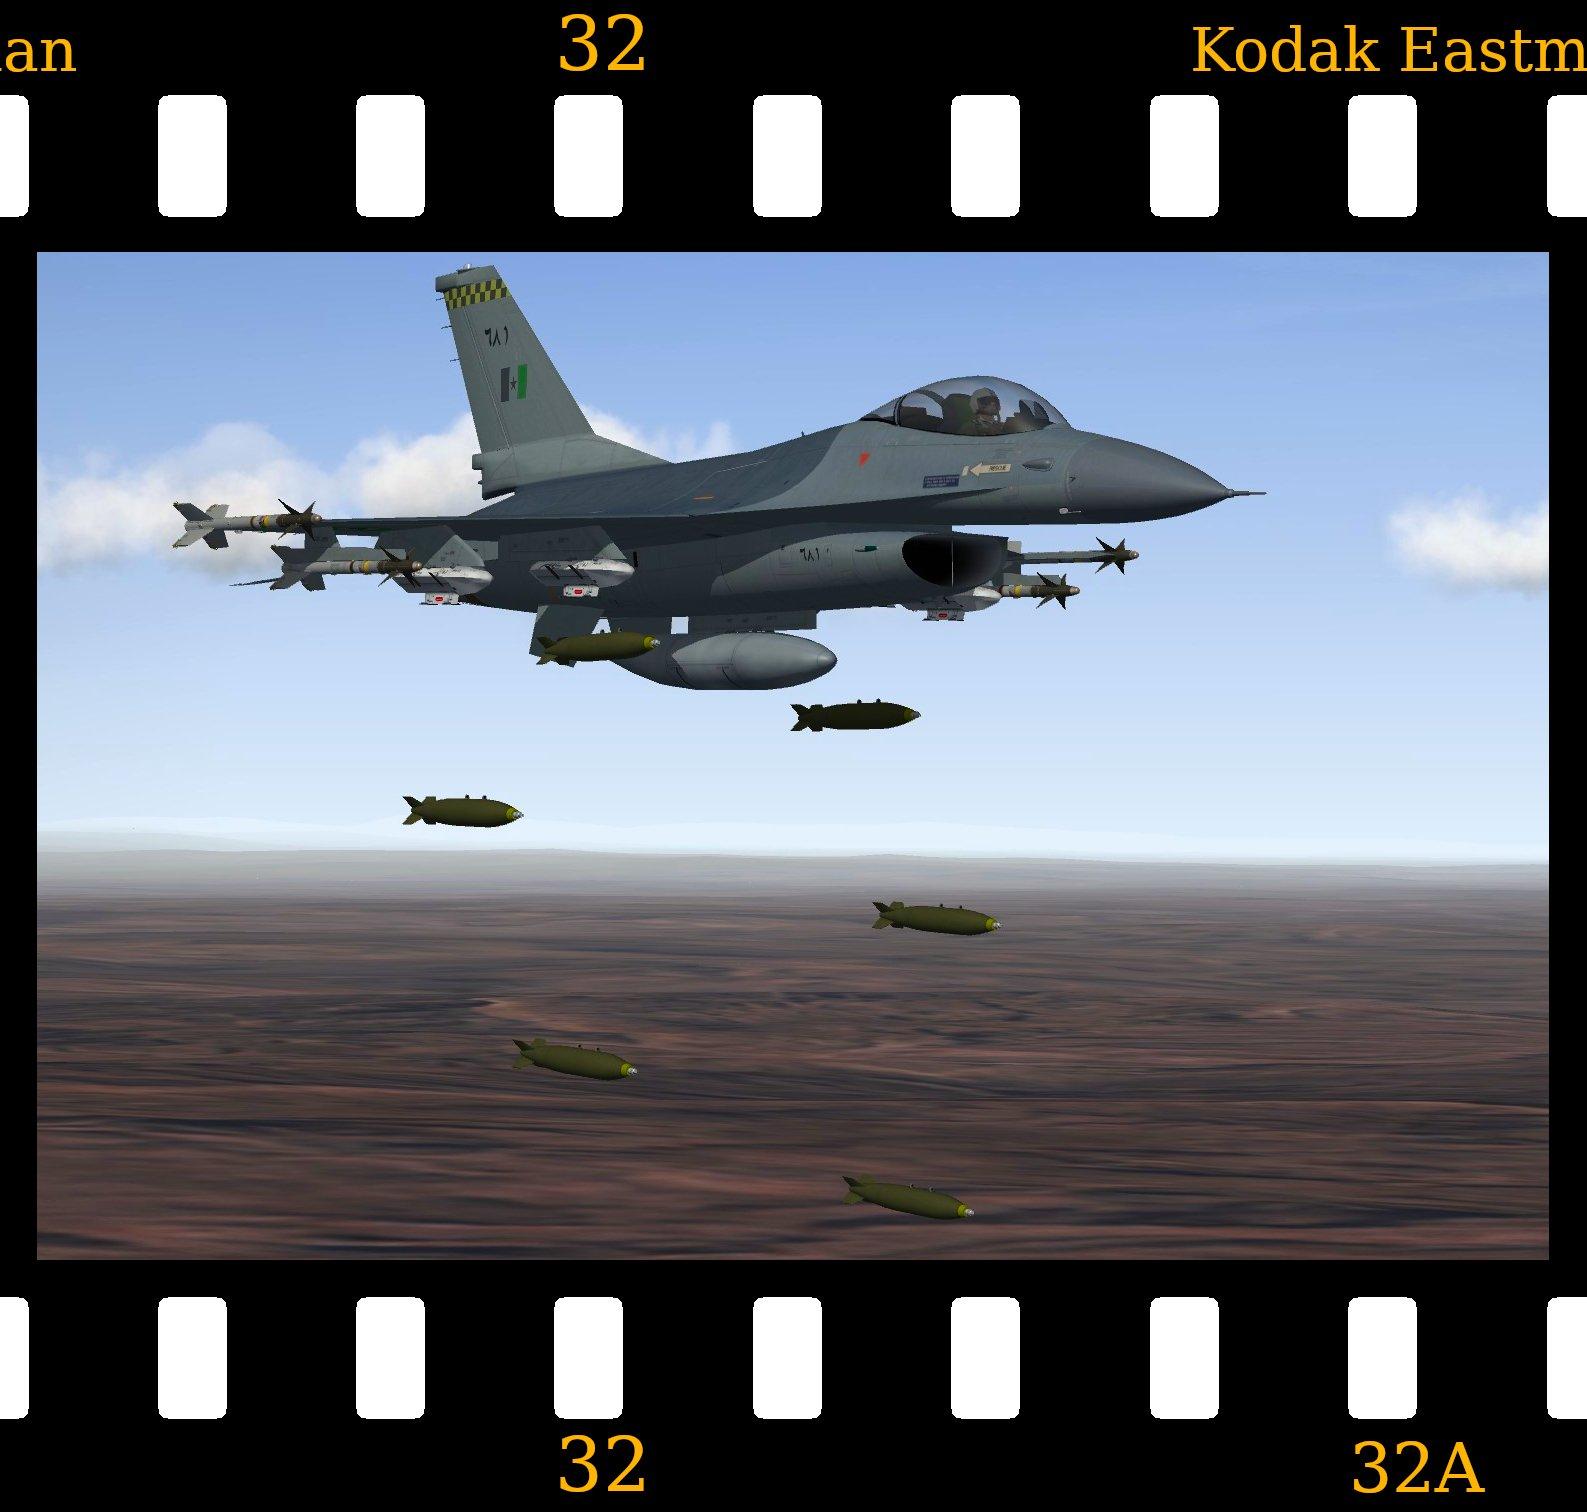 [Fictional] General Dynamics F-16A 'Dhimar'